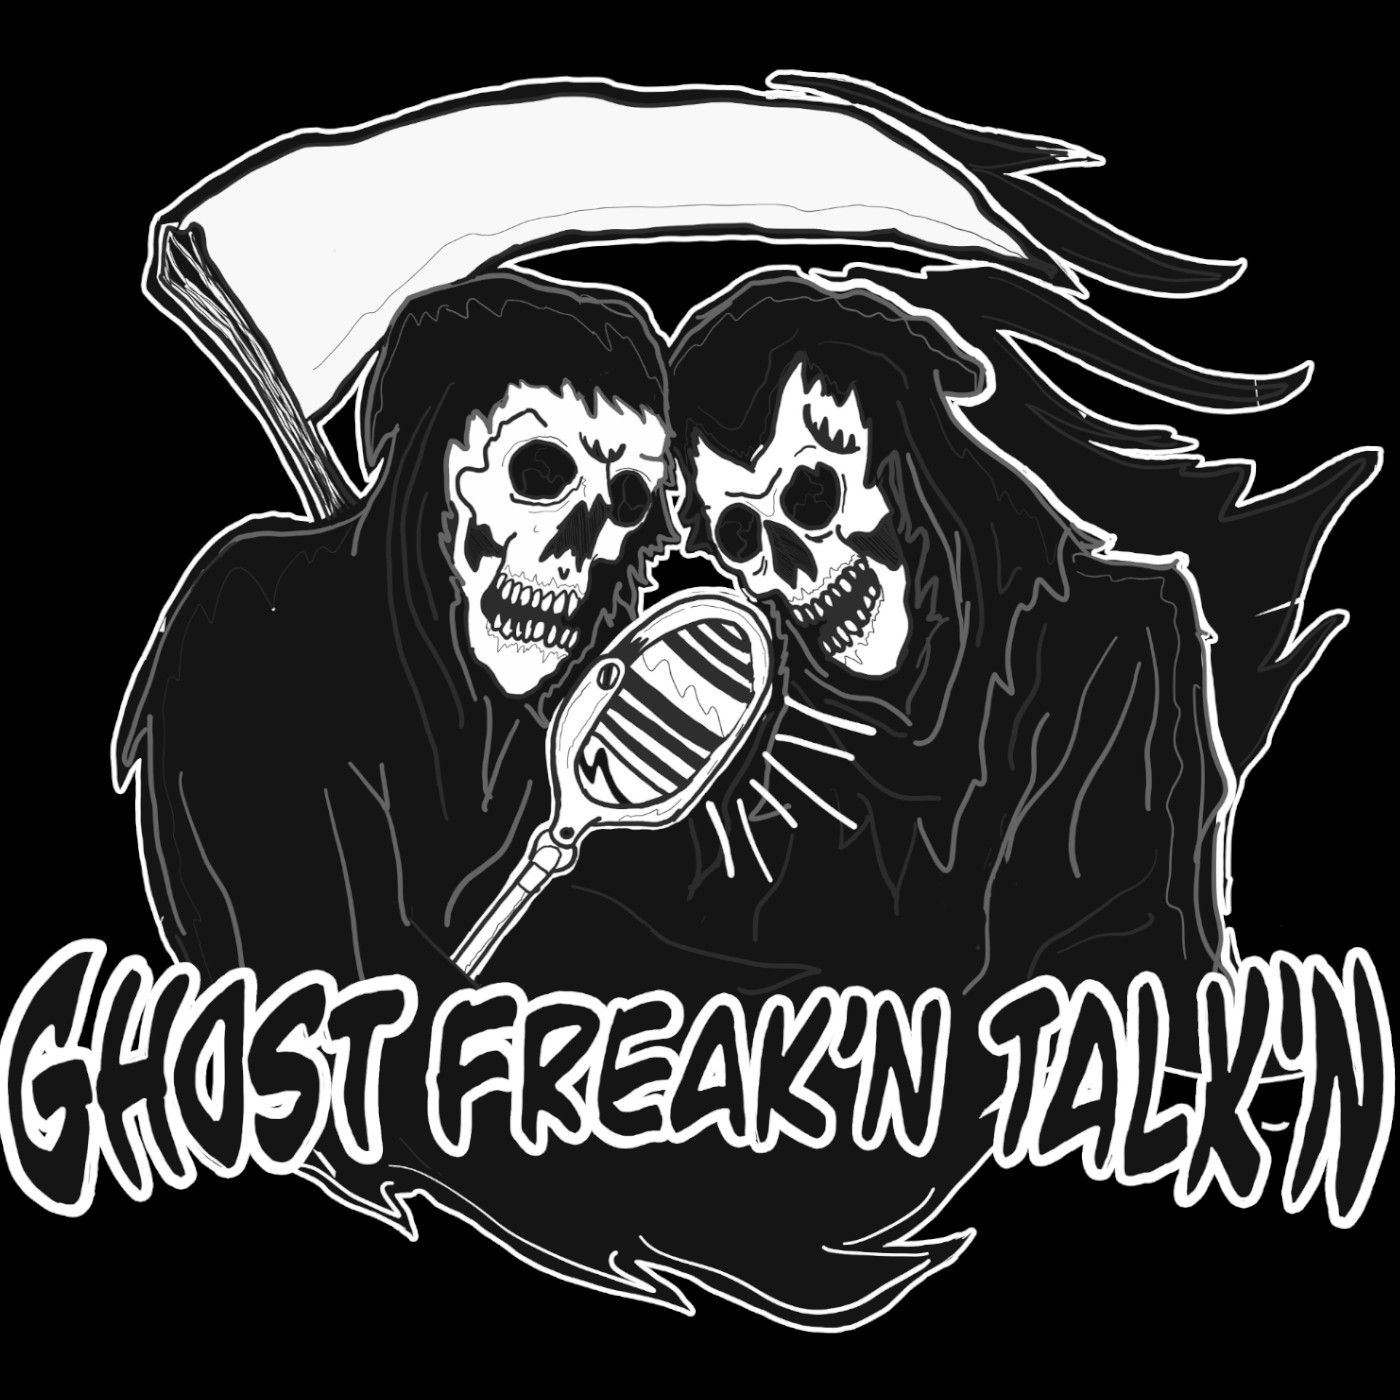 Ghost Freak'n Talk'n Podcast